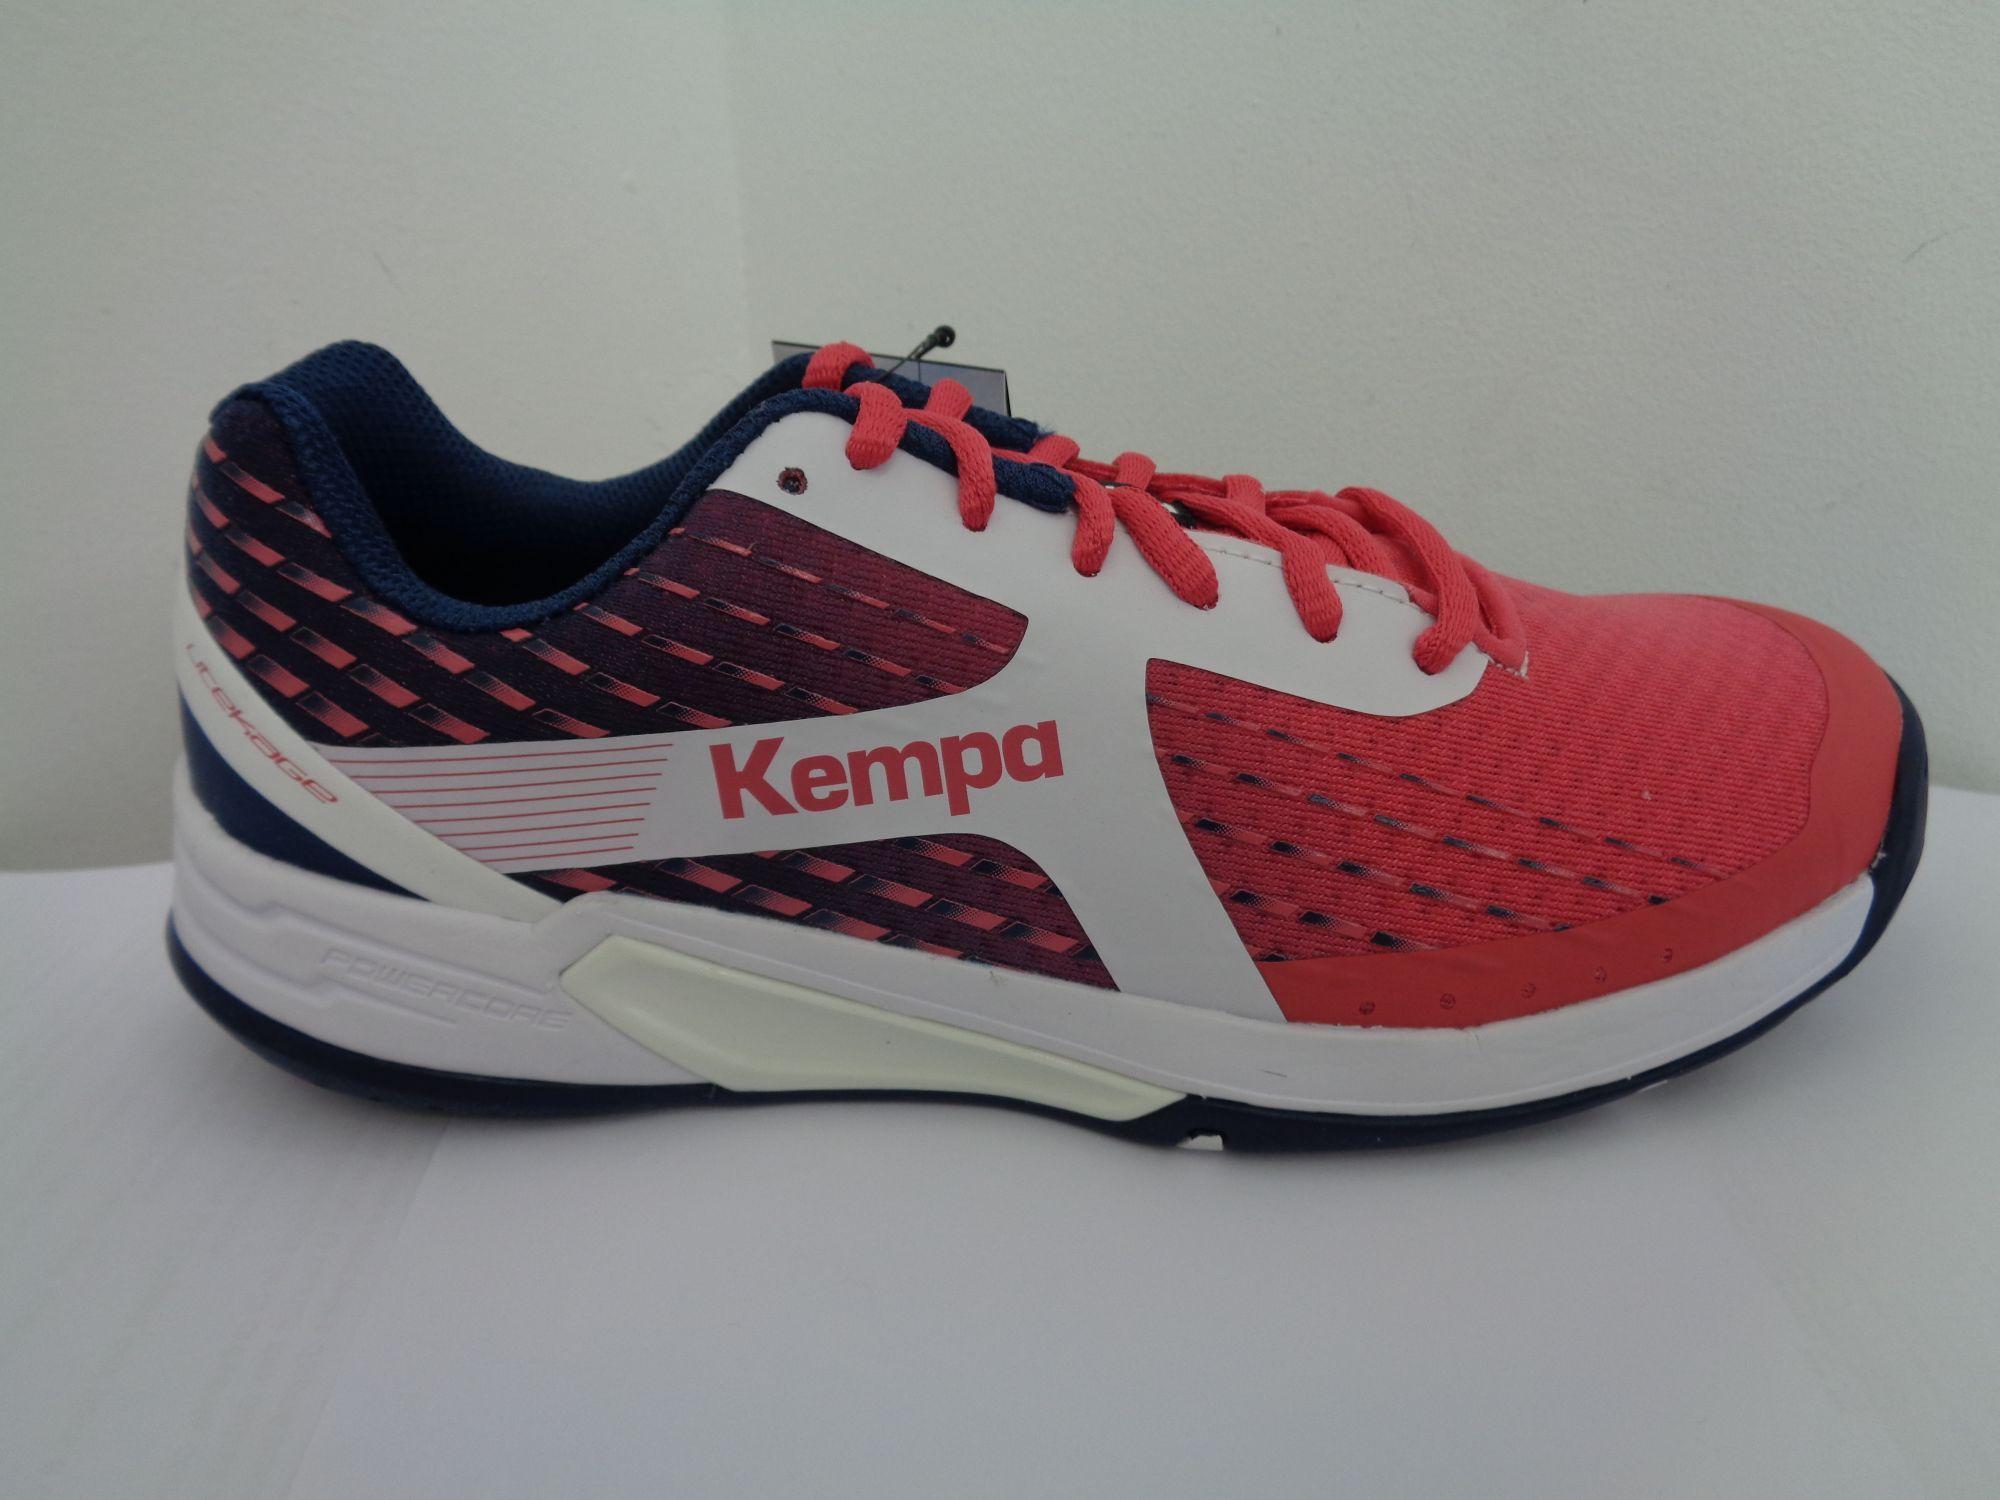 Kempa wing women